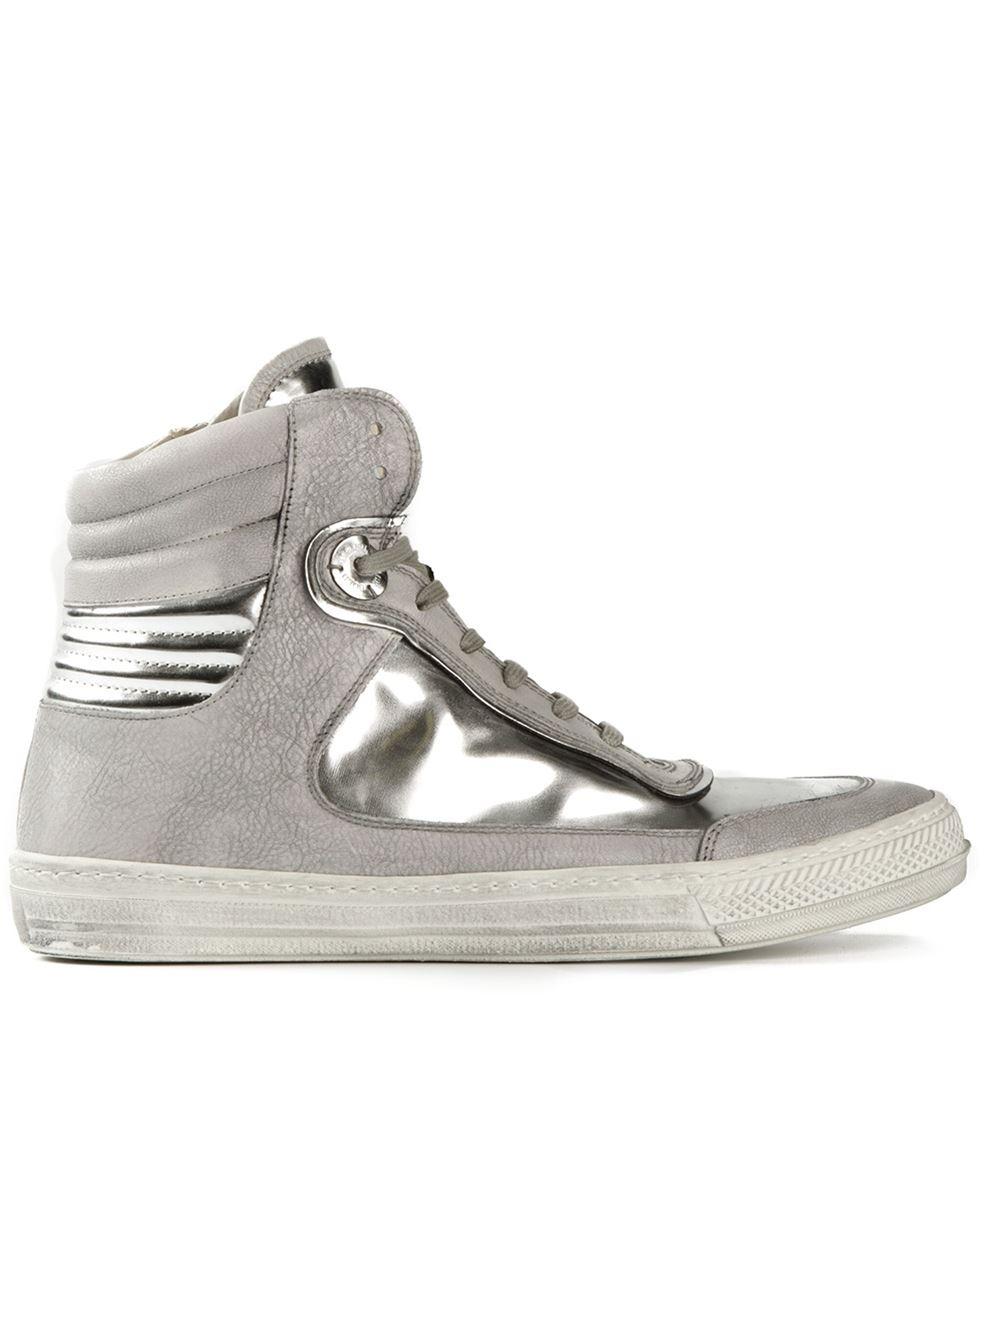 c411a865613d Lyst - Diesel Black Gold Metallic Hi-Top Sneakers in Metallic for Men